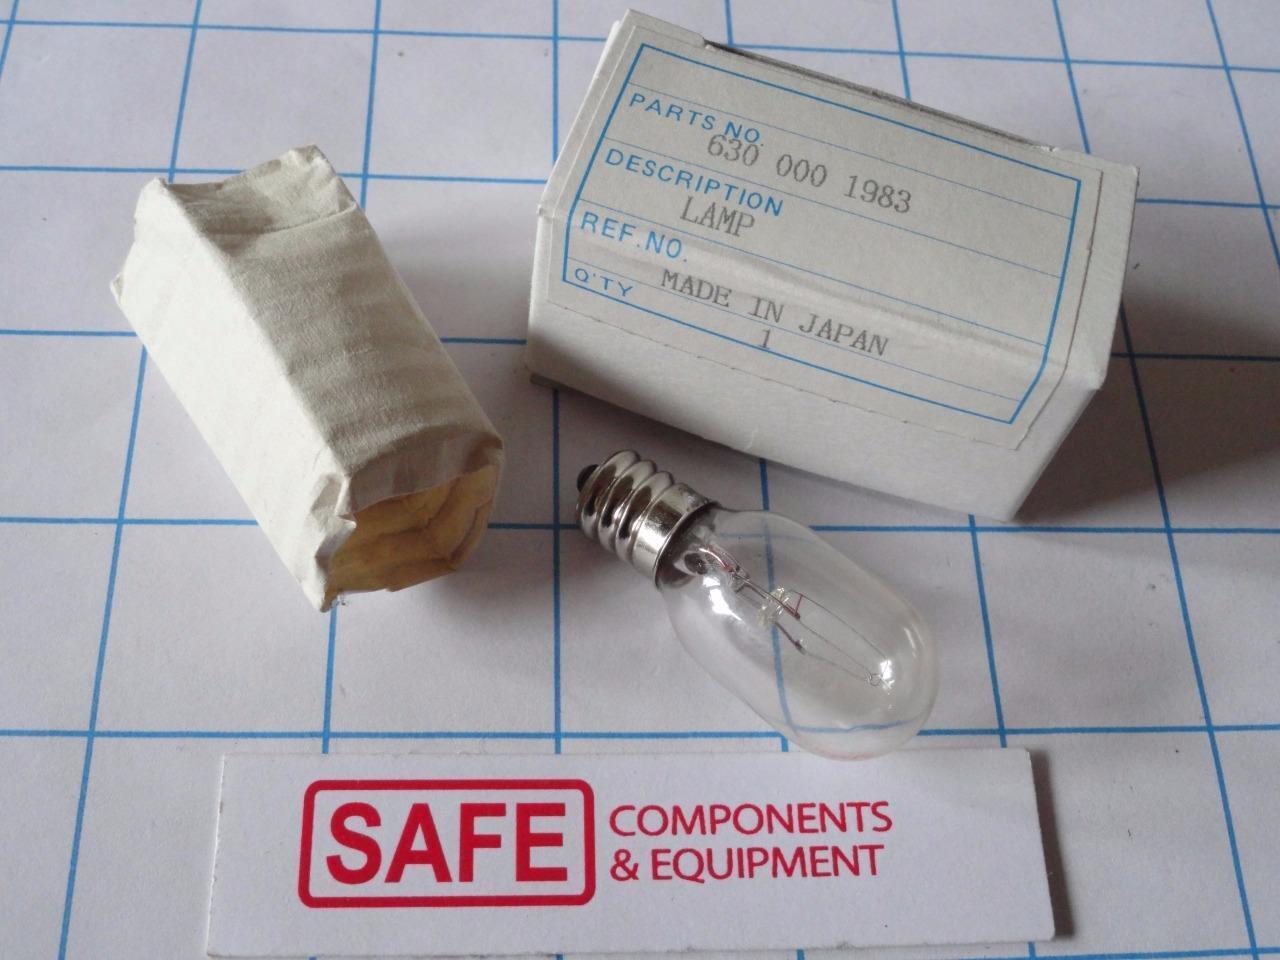 Universal Instruments HSP 4790 Tower Light Bulb 30V 10W Screw Base QTY-1 G53